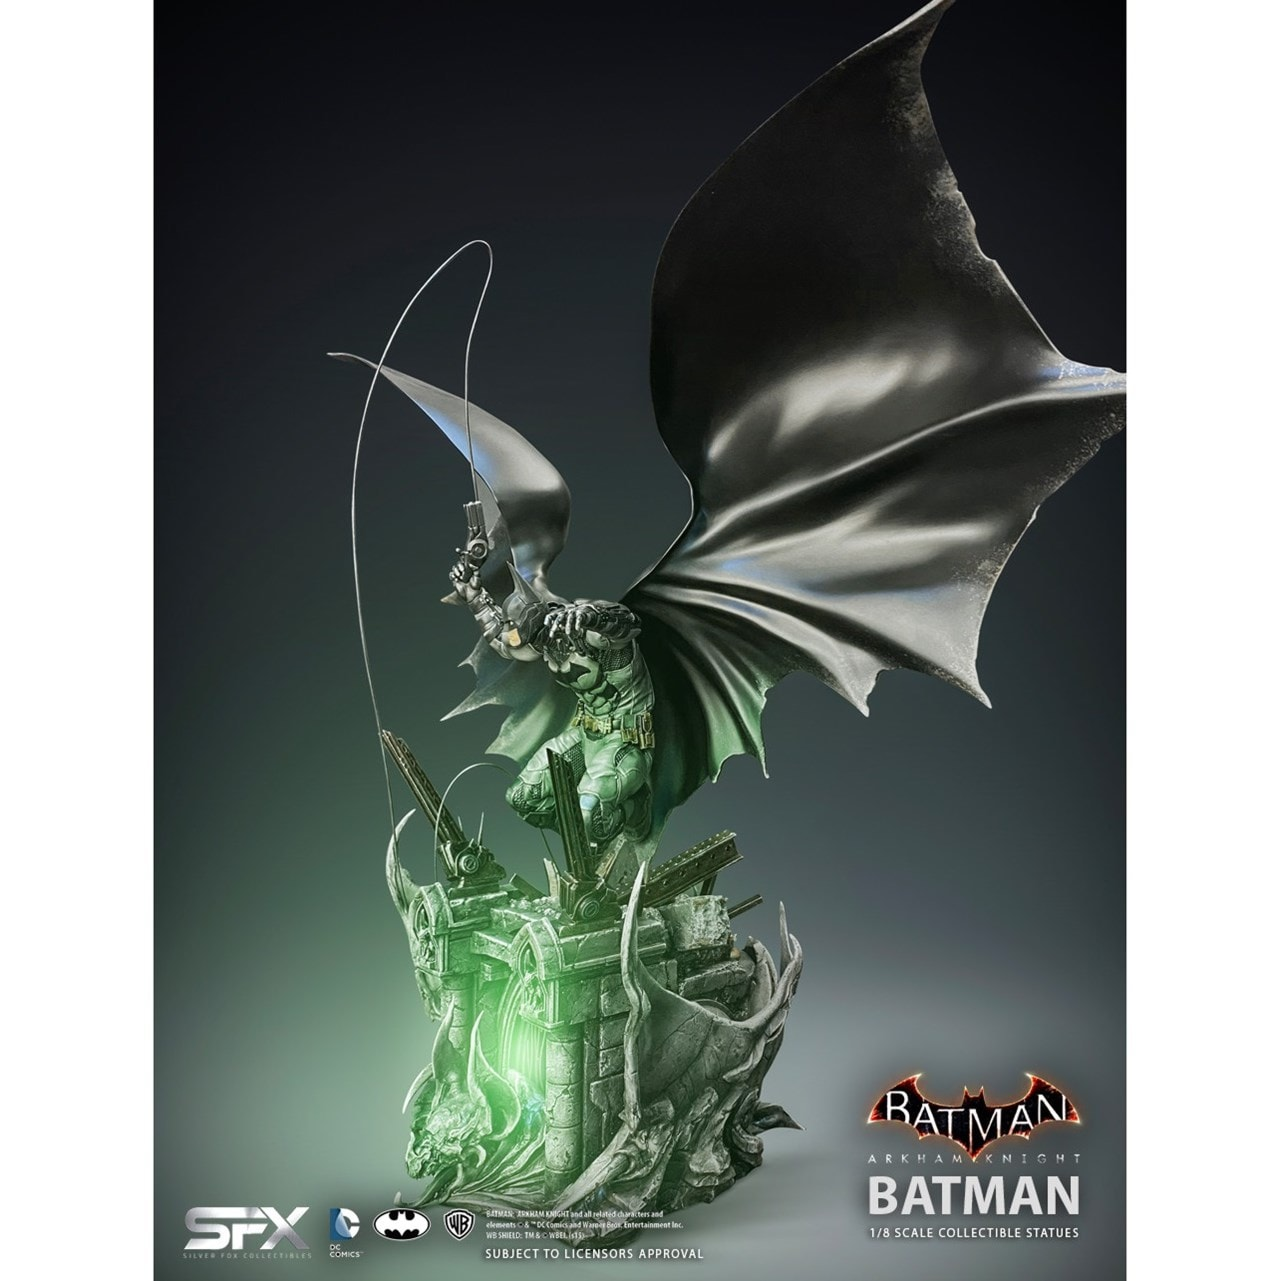 Batman: Arkham Knight Collectible Statue - 3